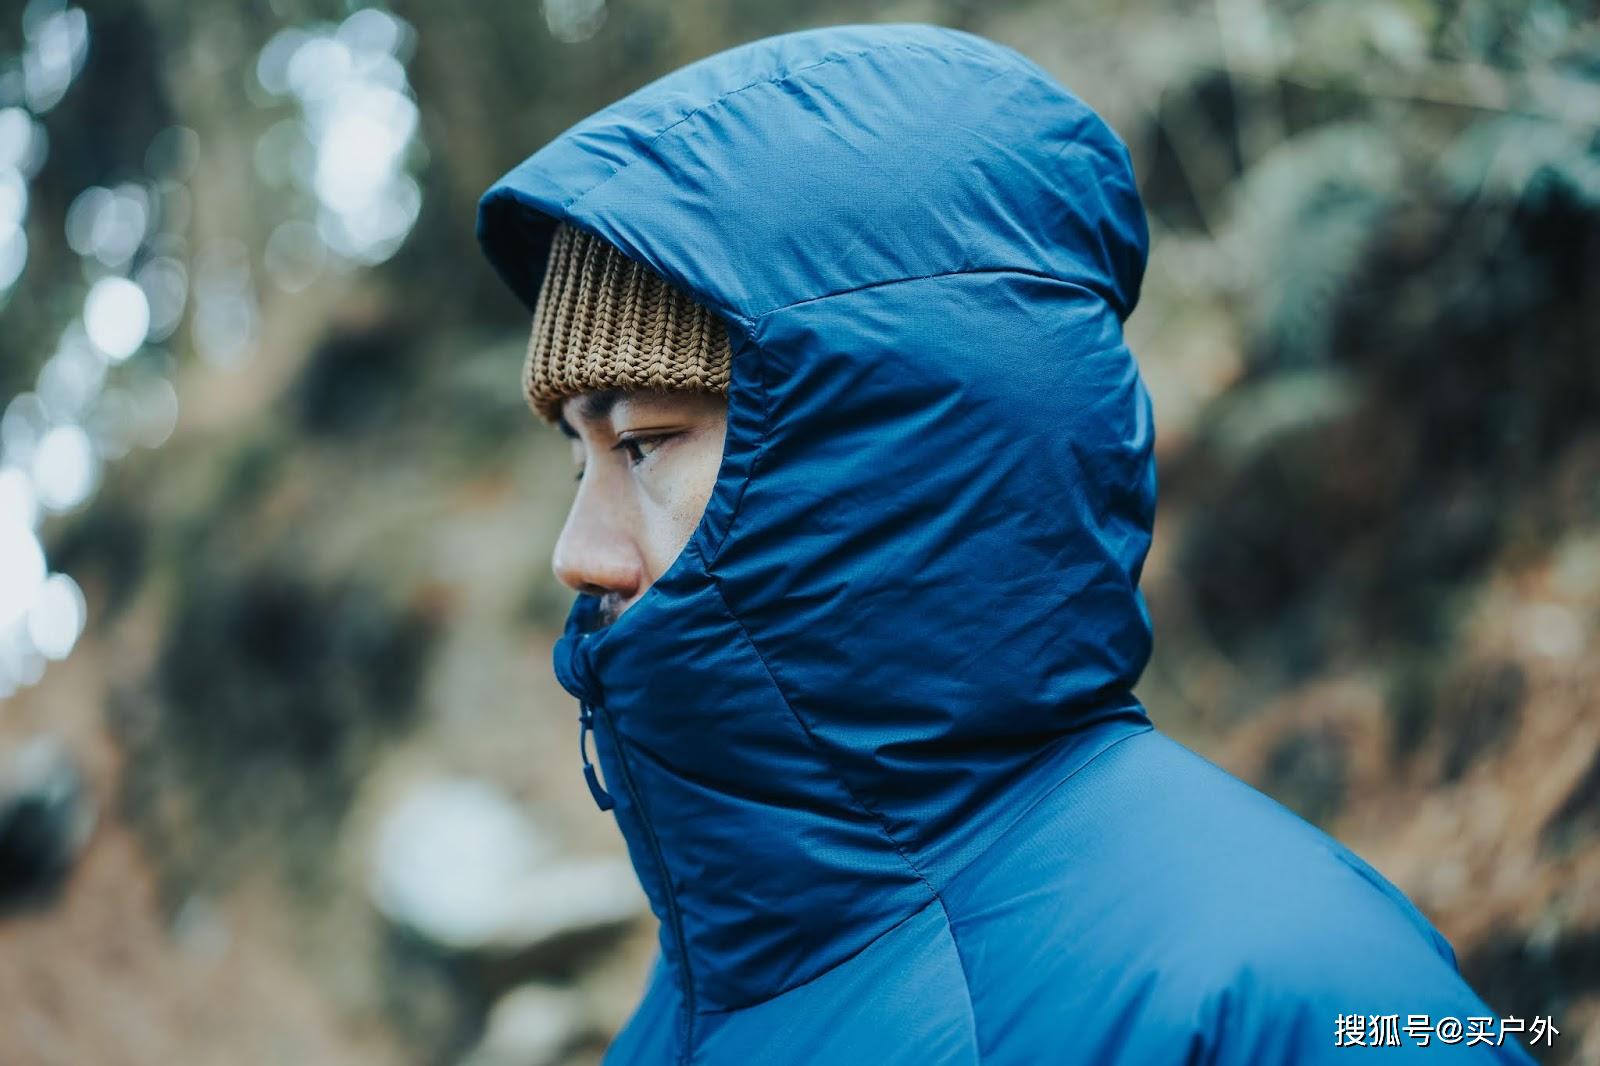 RAB防风保暖羽绒外套体验推荐,除了贵没毛病